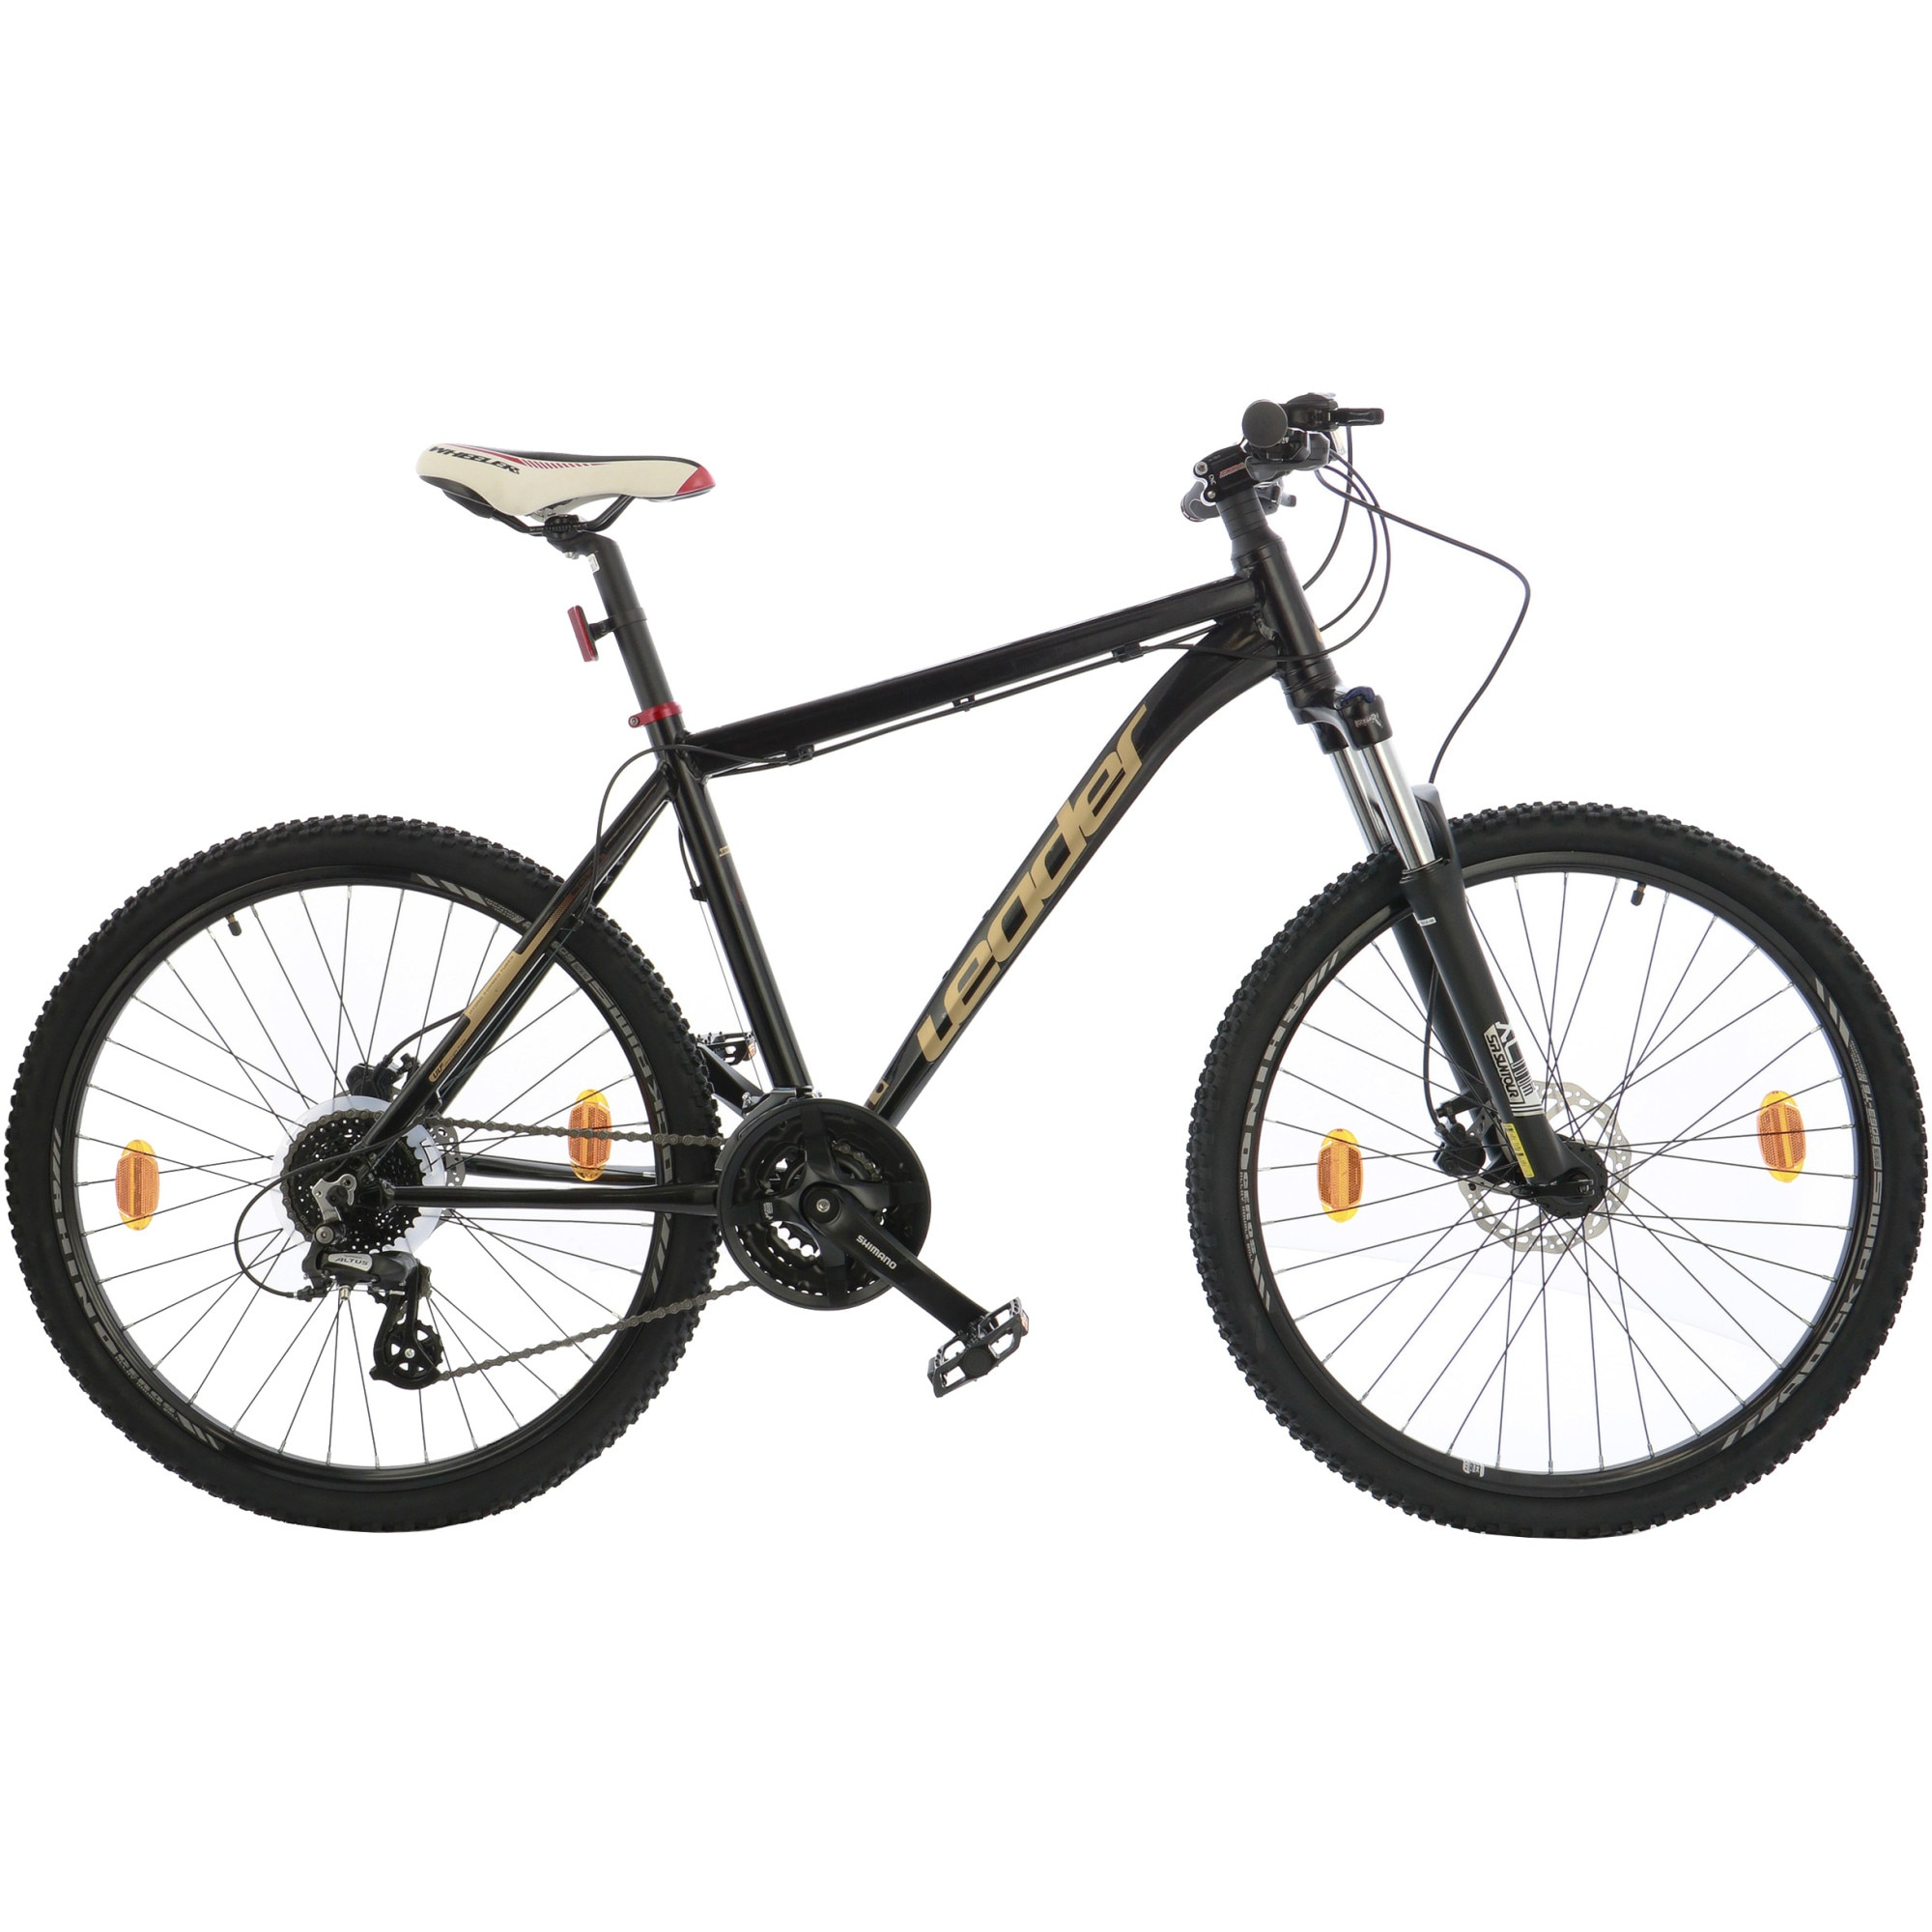 "Fotografie Bicicleta MTB 26"" Leader Trail transmisie Shimano, frane hidraulice, furca suntour XCM, cadru AL, 46cm, Black"